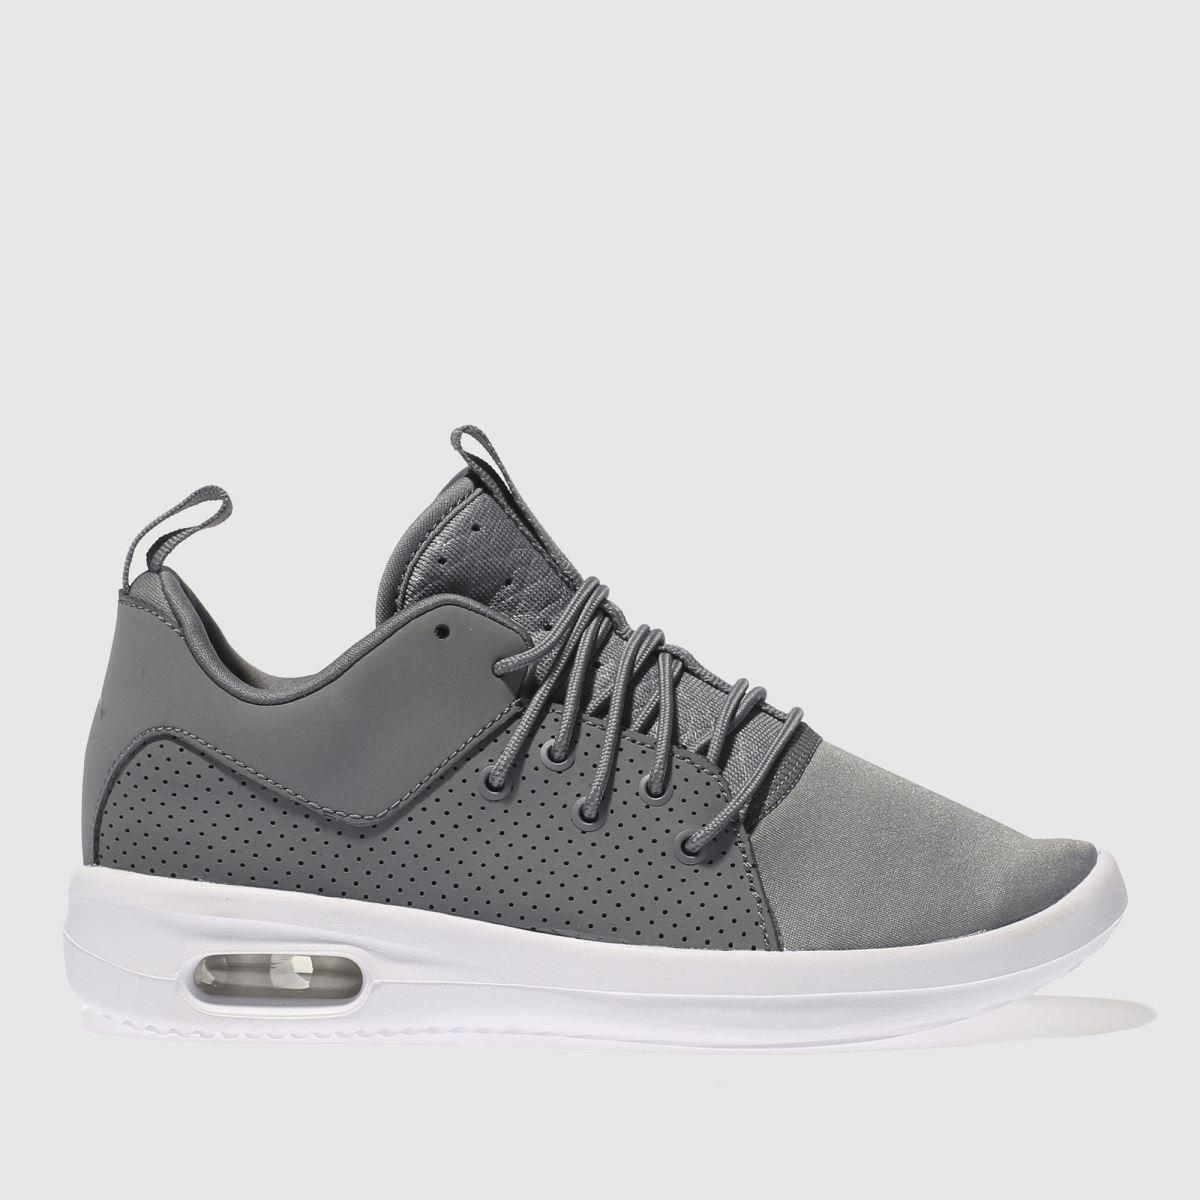 Nike Jordan Grey First Class Junior Trainers